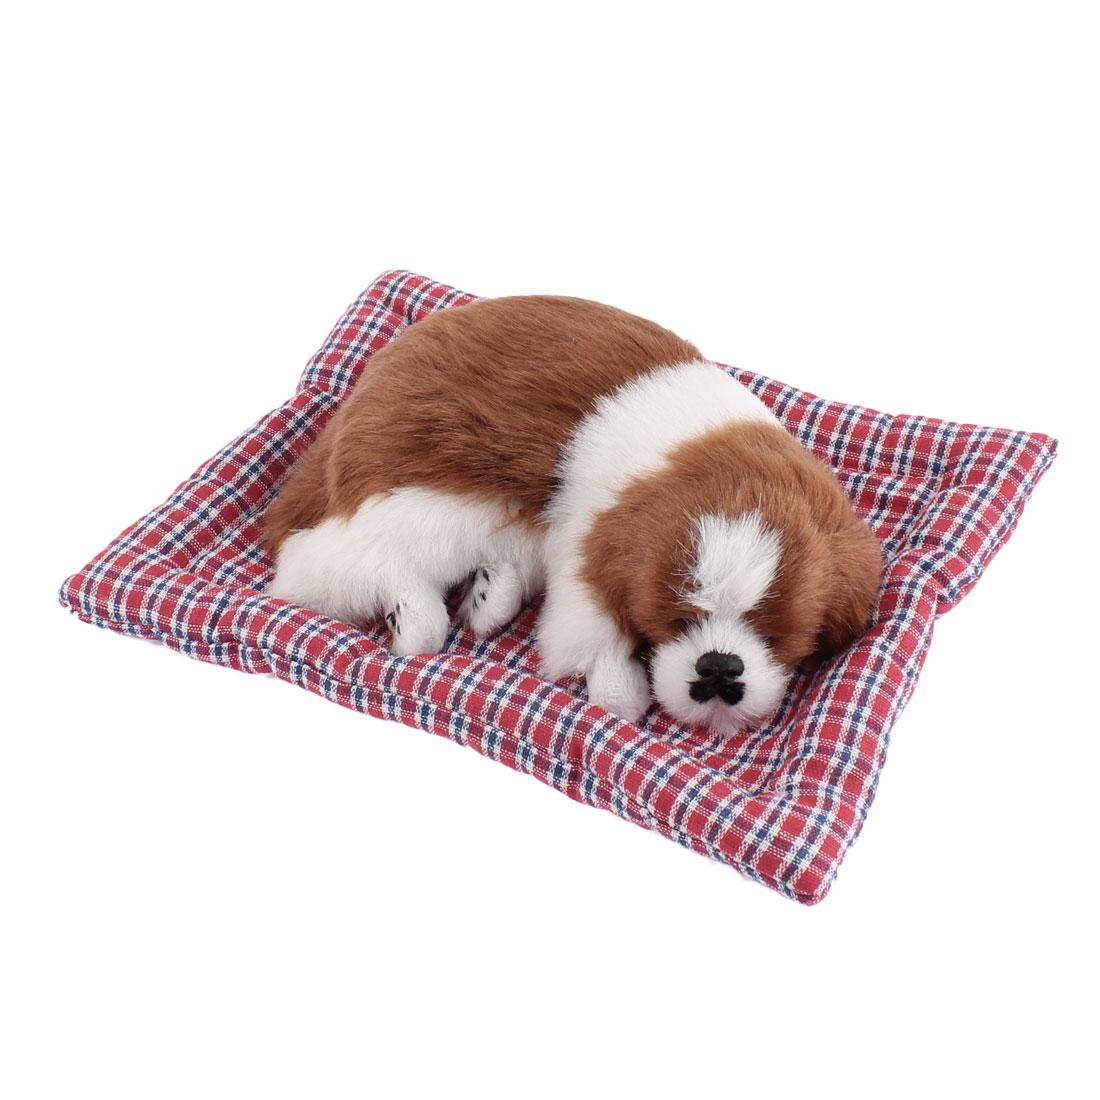 Home Car Simulation Sound Animal Sleeping Dog Ornament